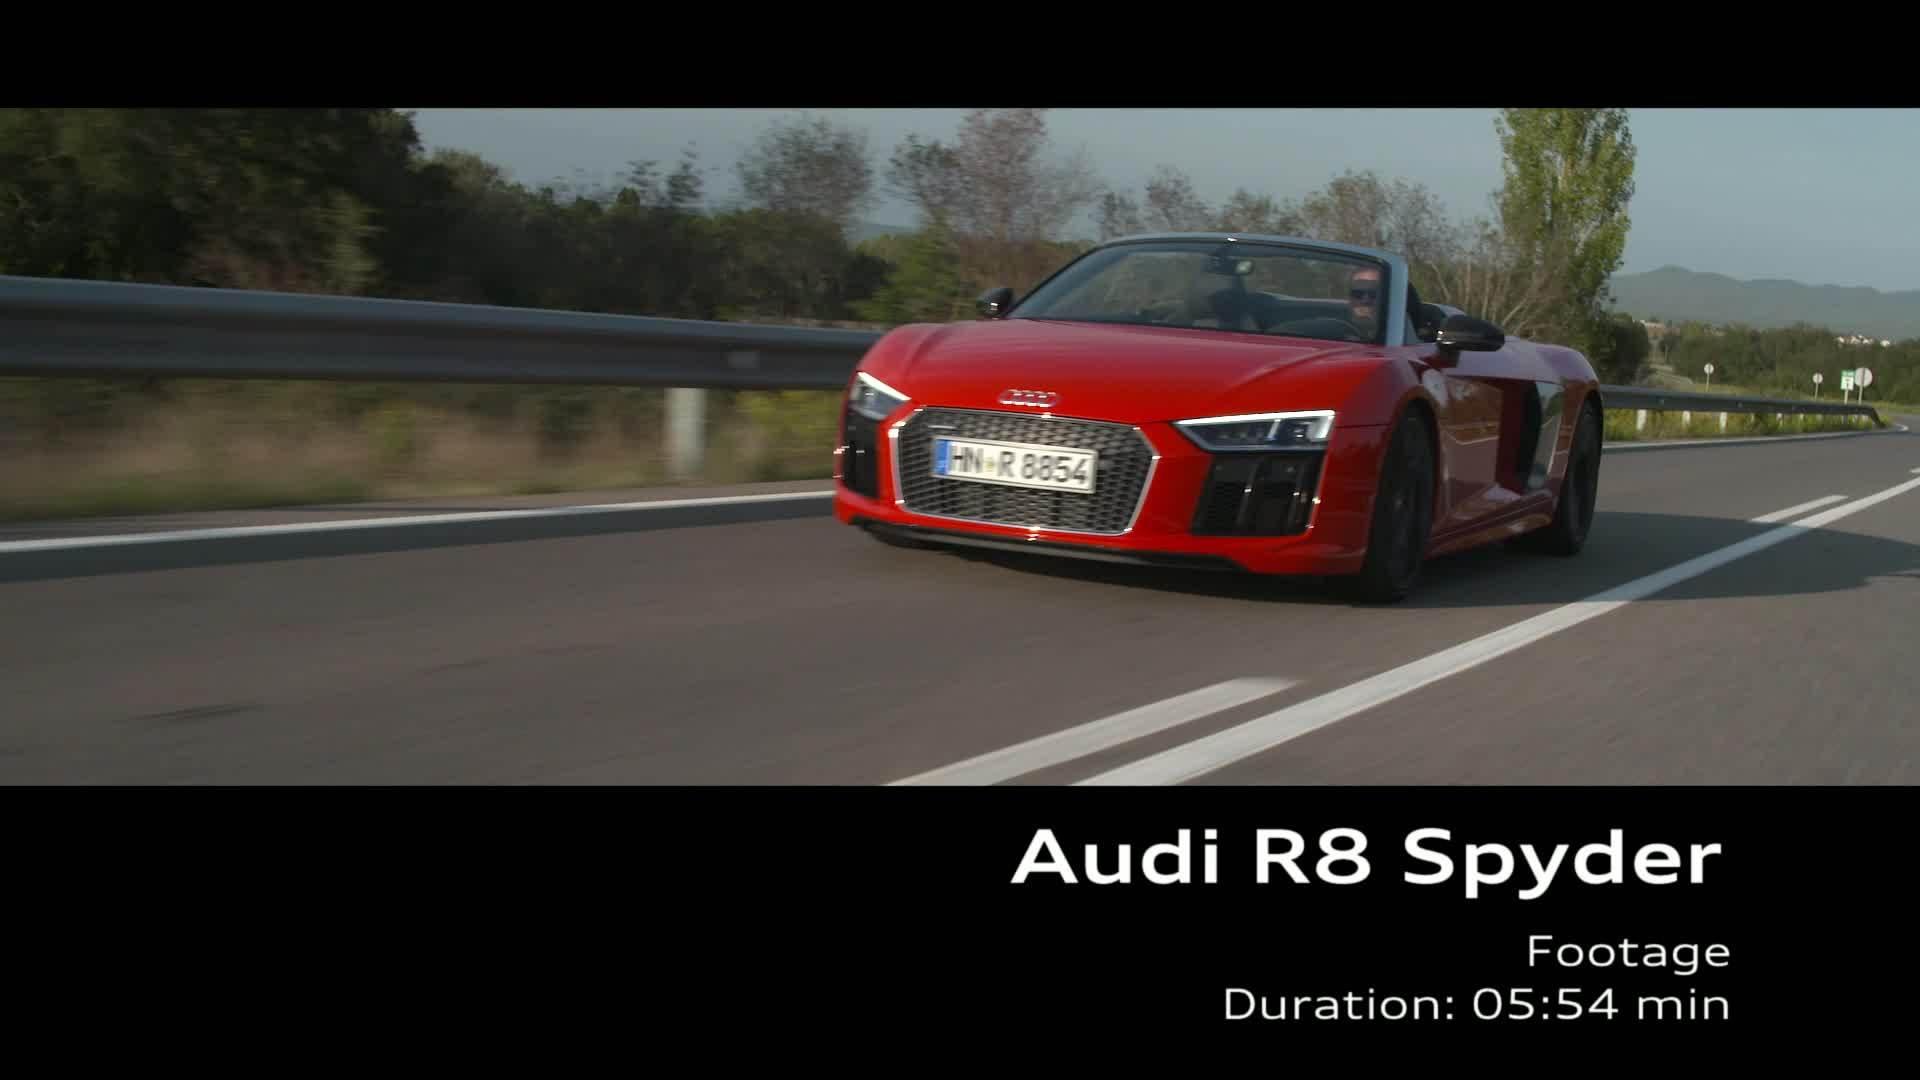 Audi R8 Spyder Footage Rot